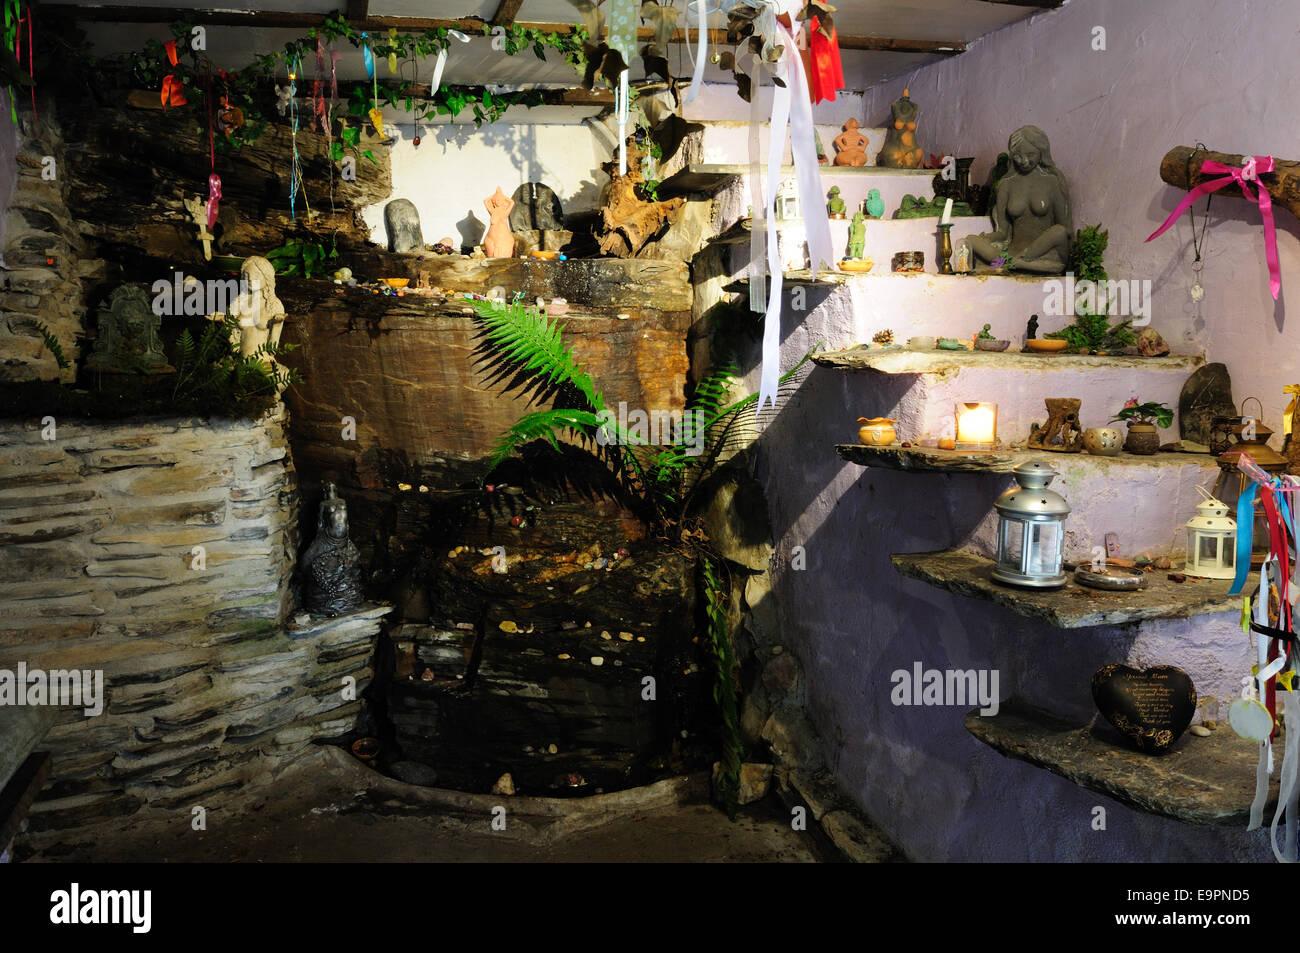 Offerte votive in St cella Nectans Tintagel Cornwall Inghilterra UK GB Immagini Stock